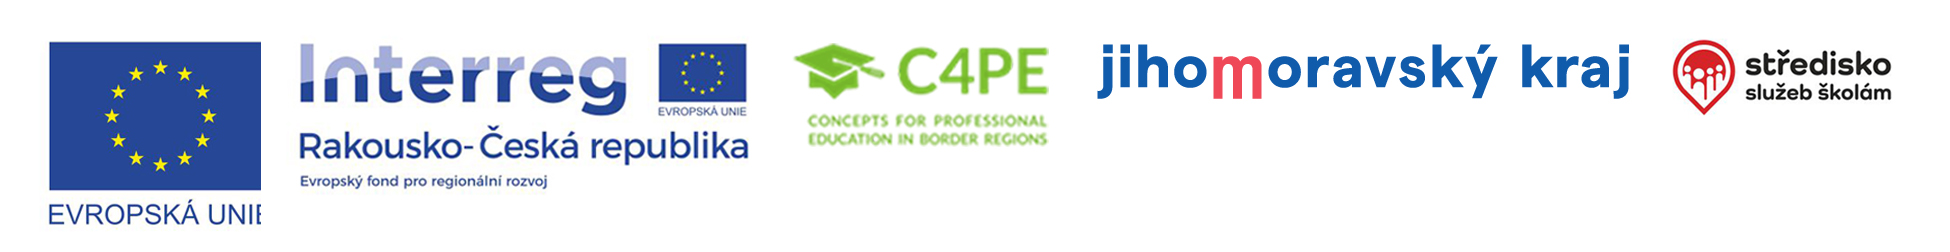 c4pe-logo